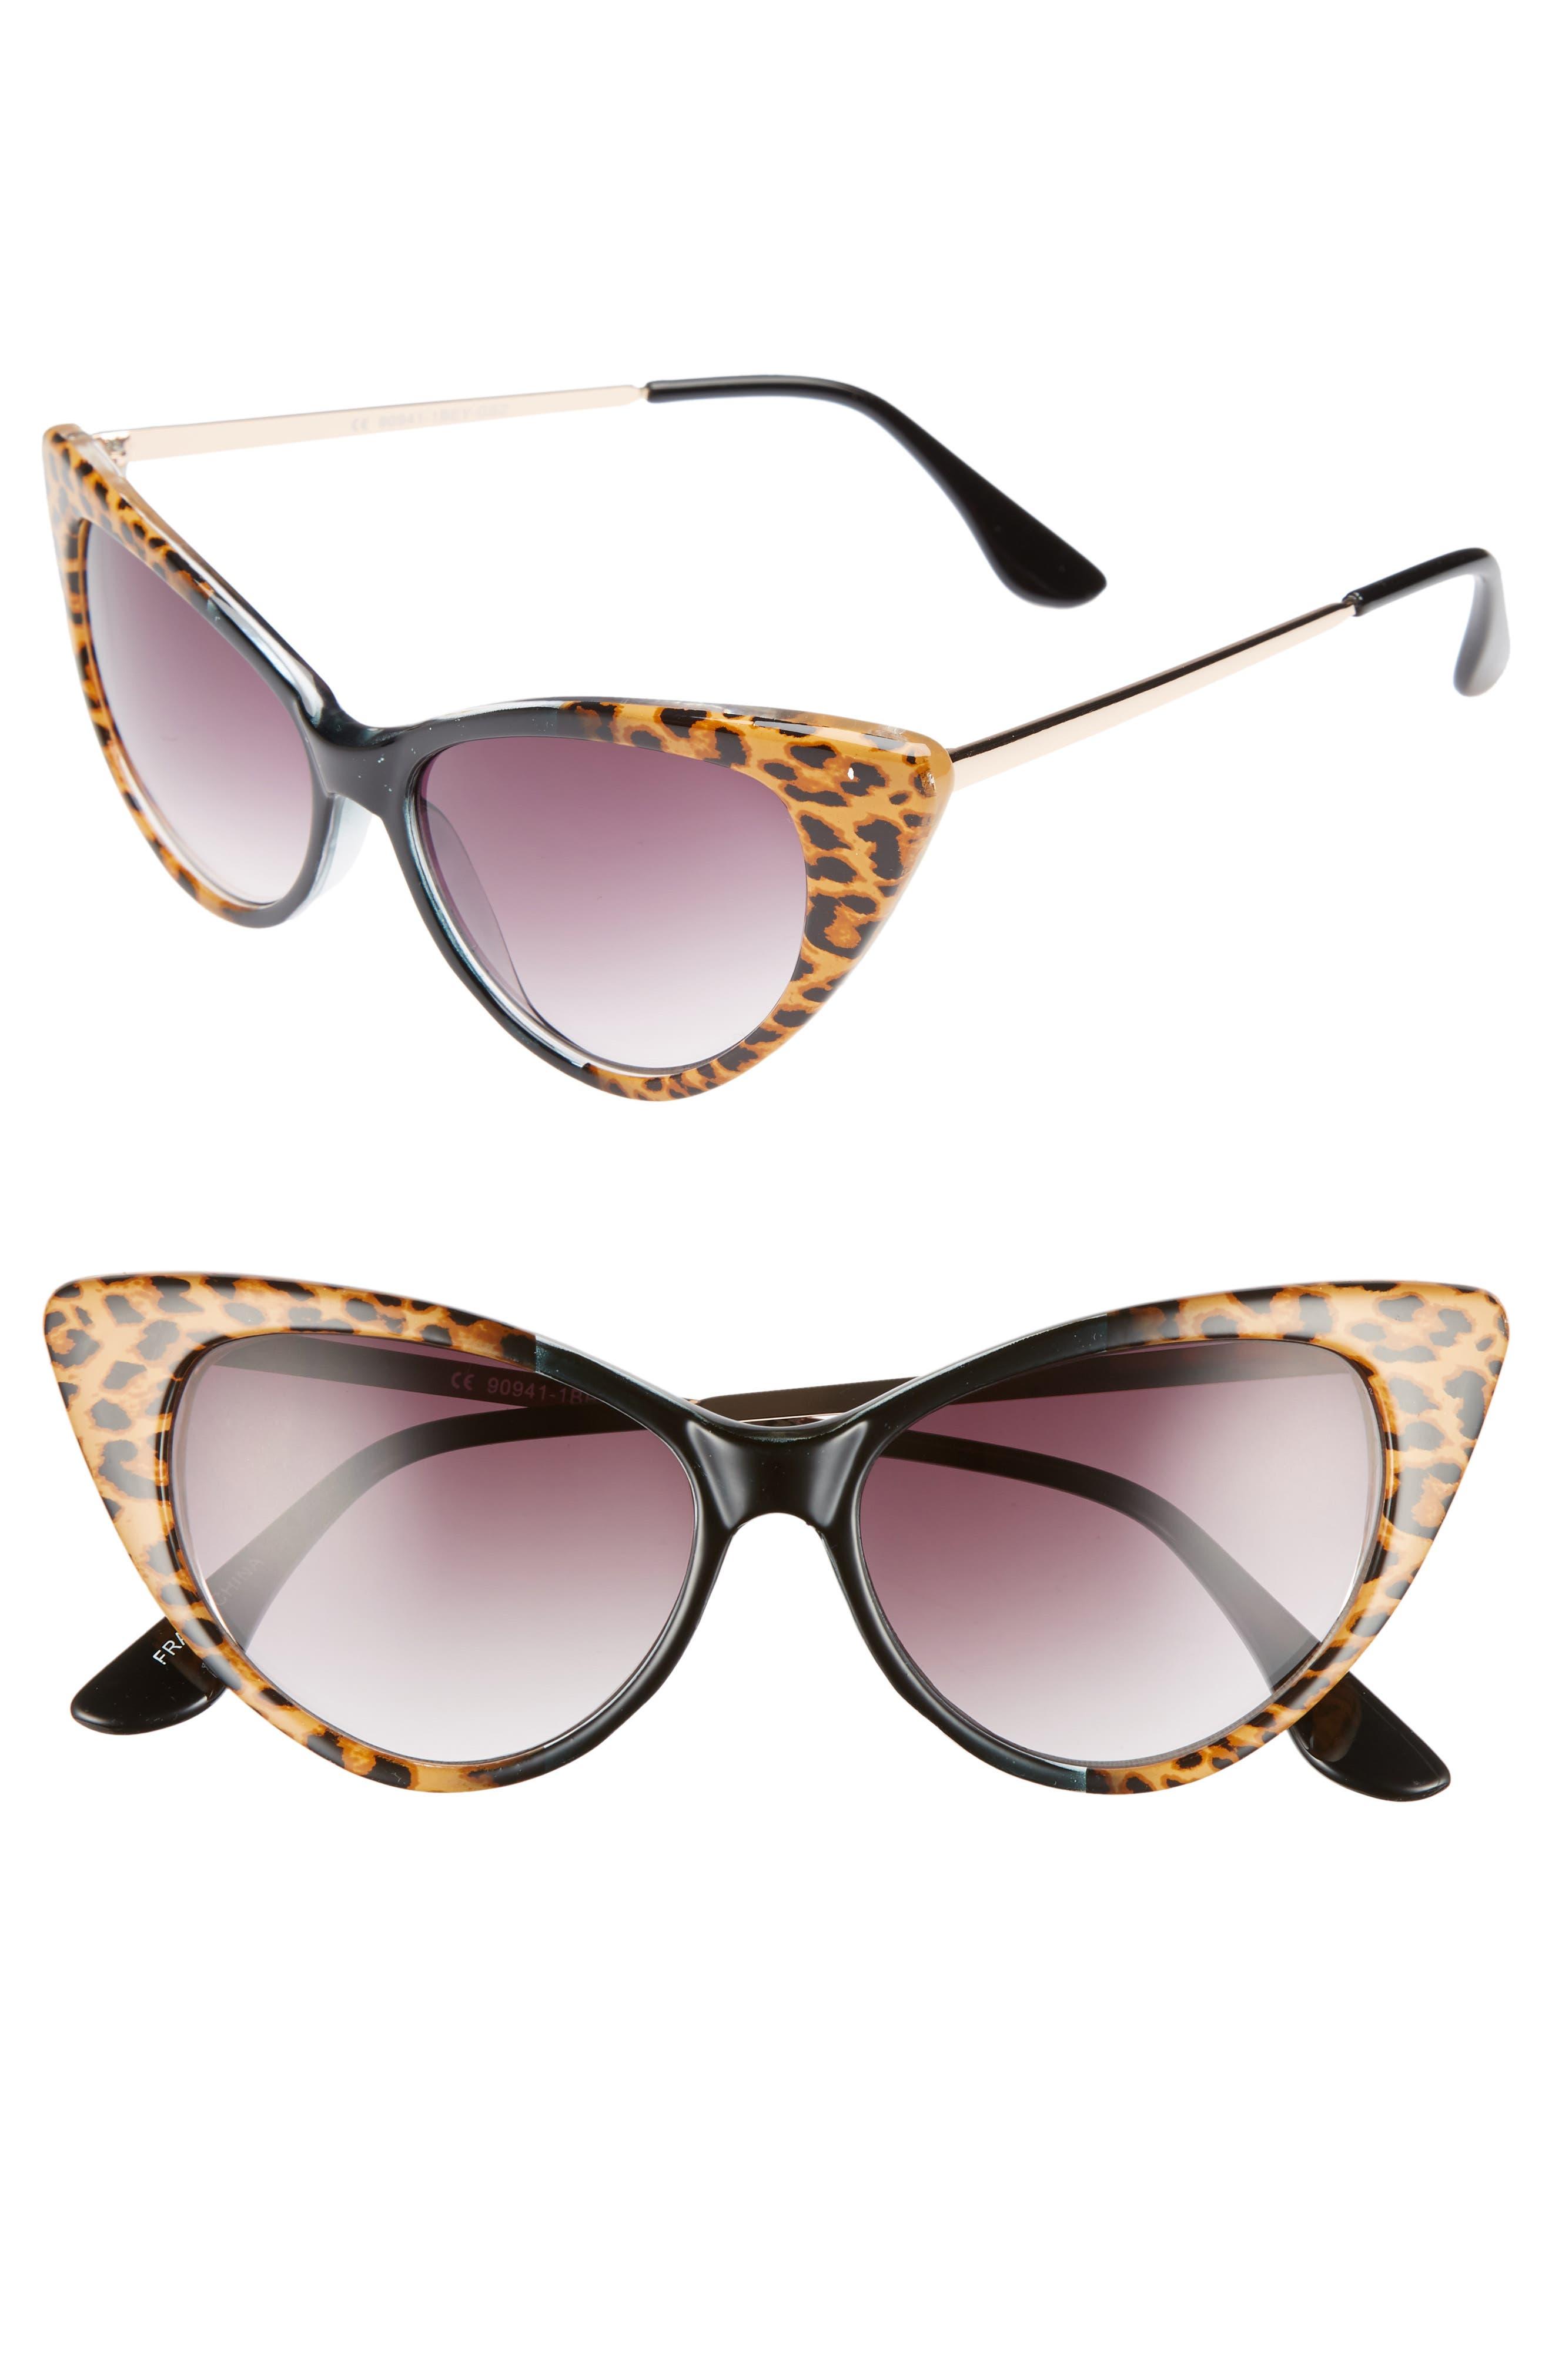 GLANCE EYEWEAR,                             62mm Leopard Print Cat Eye Sunglasses,                             Main thumbnail 1, color,                             001